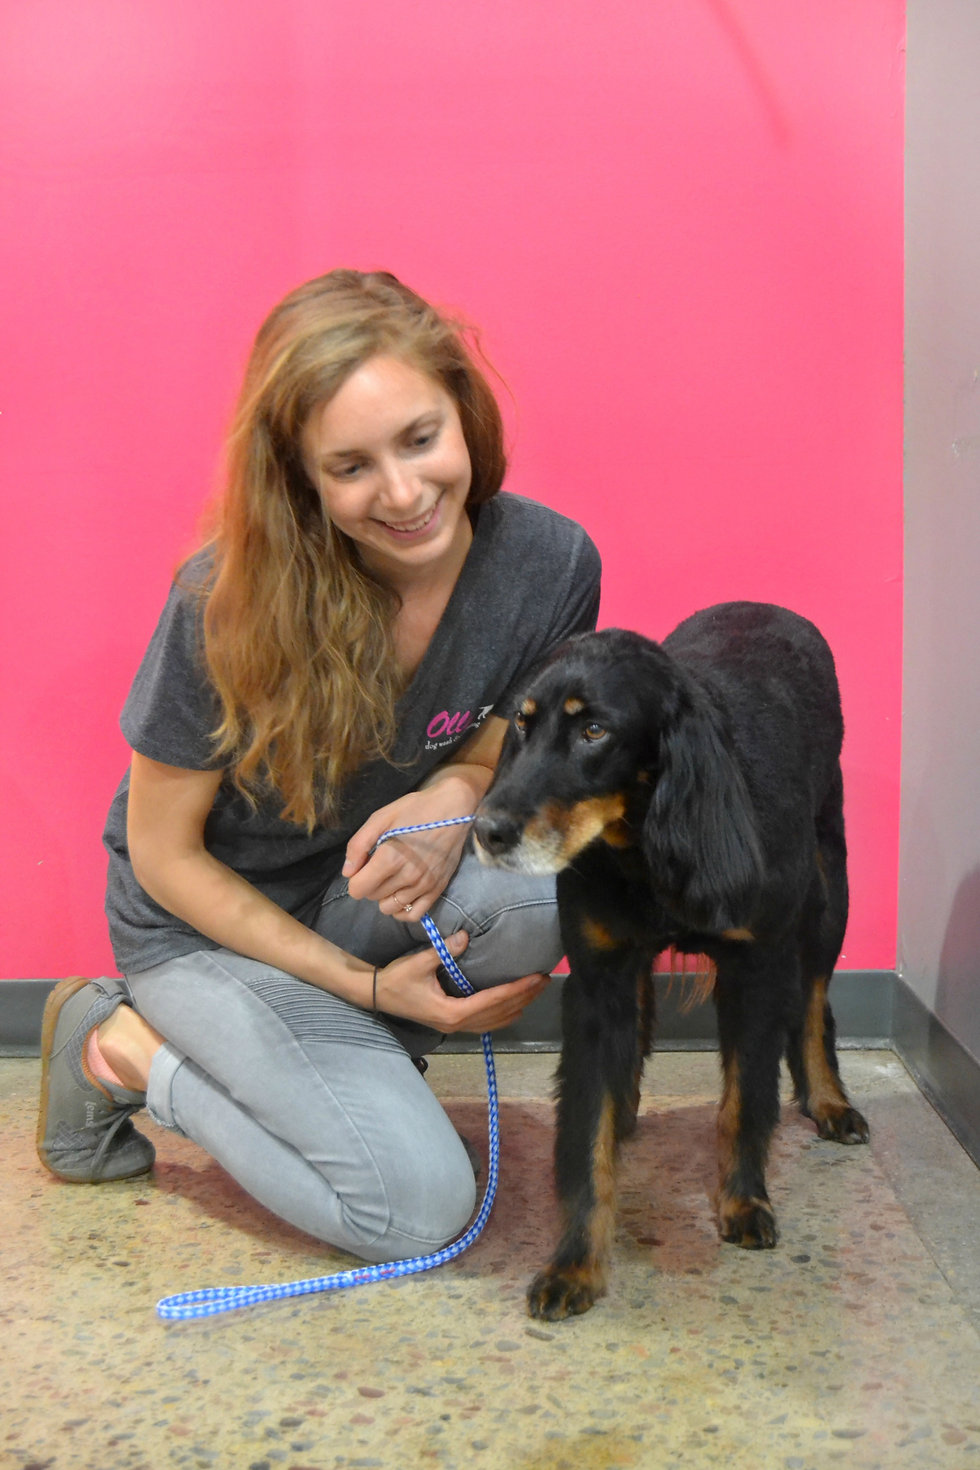 Female groomer kneeling next toblac dog with pink background